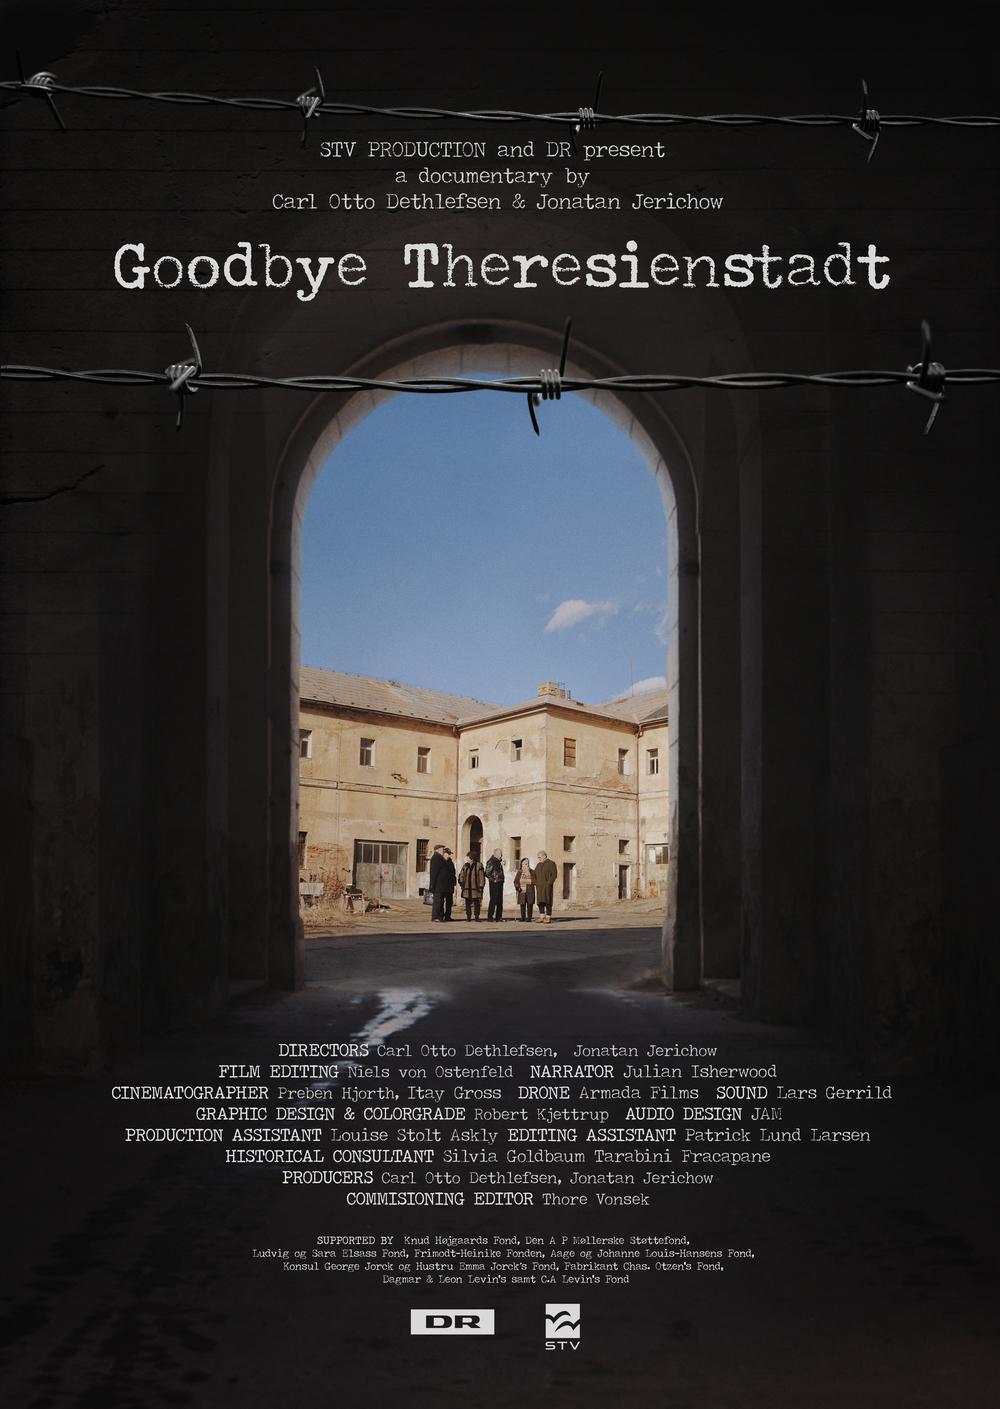 Poster_GoodbyeTheresienstadt.jpg